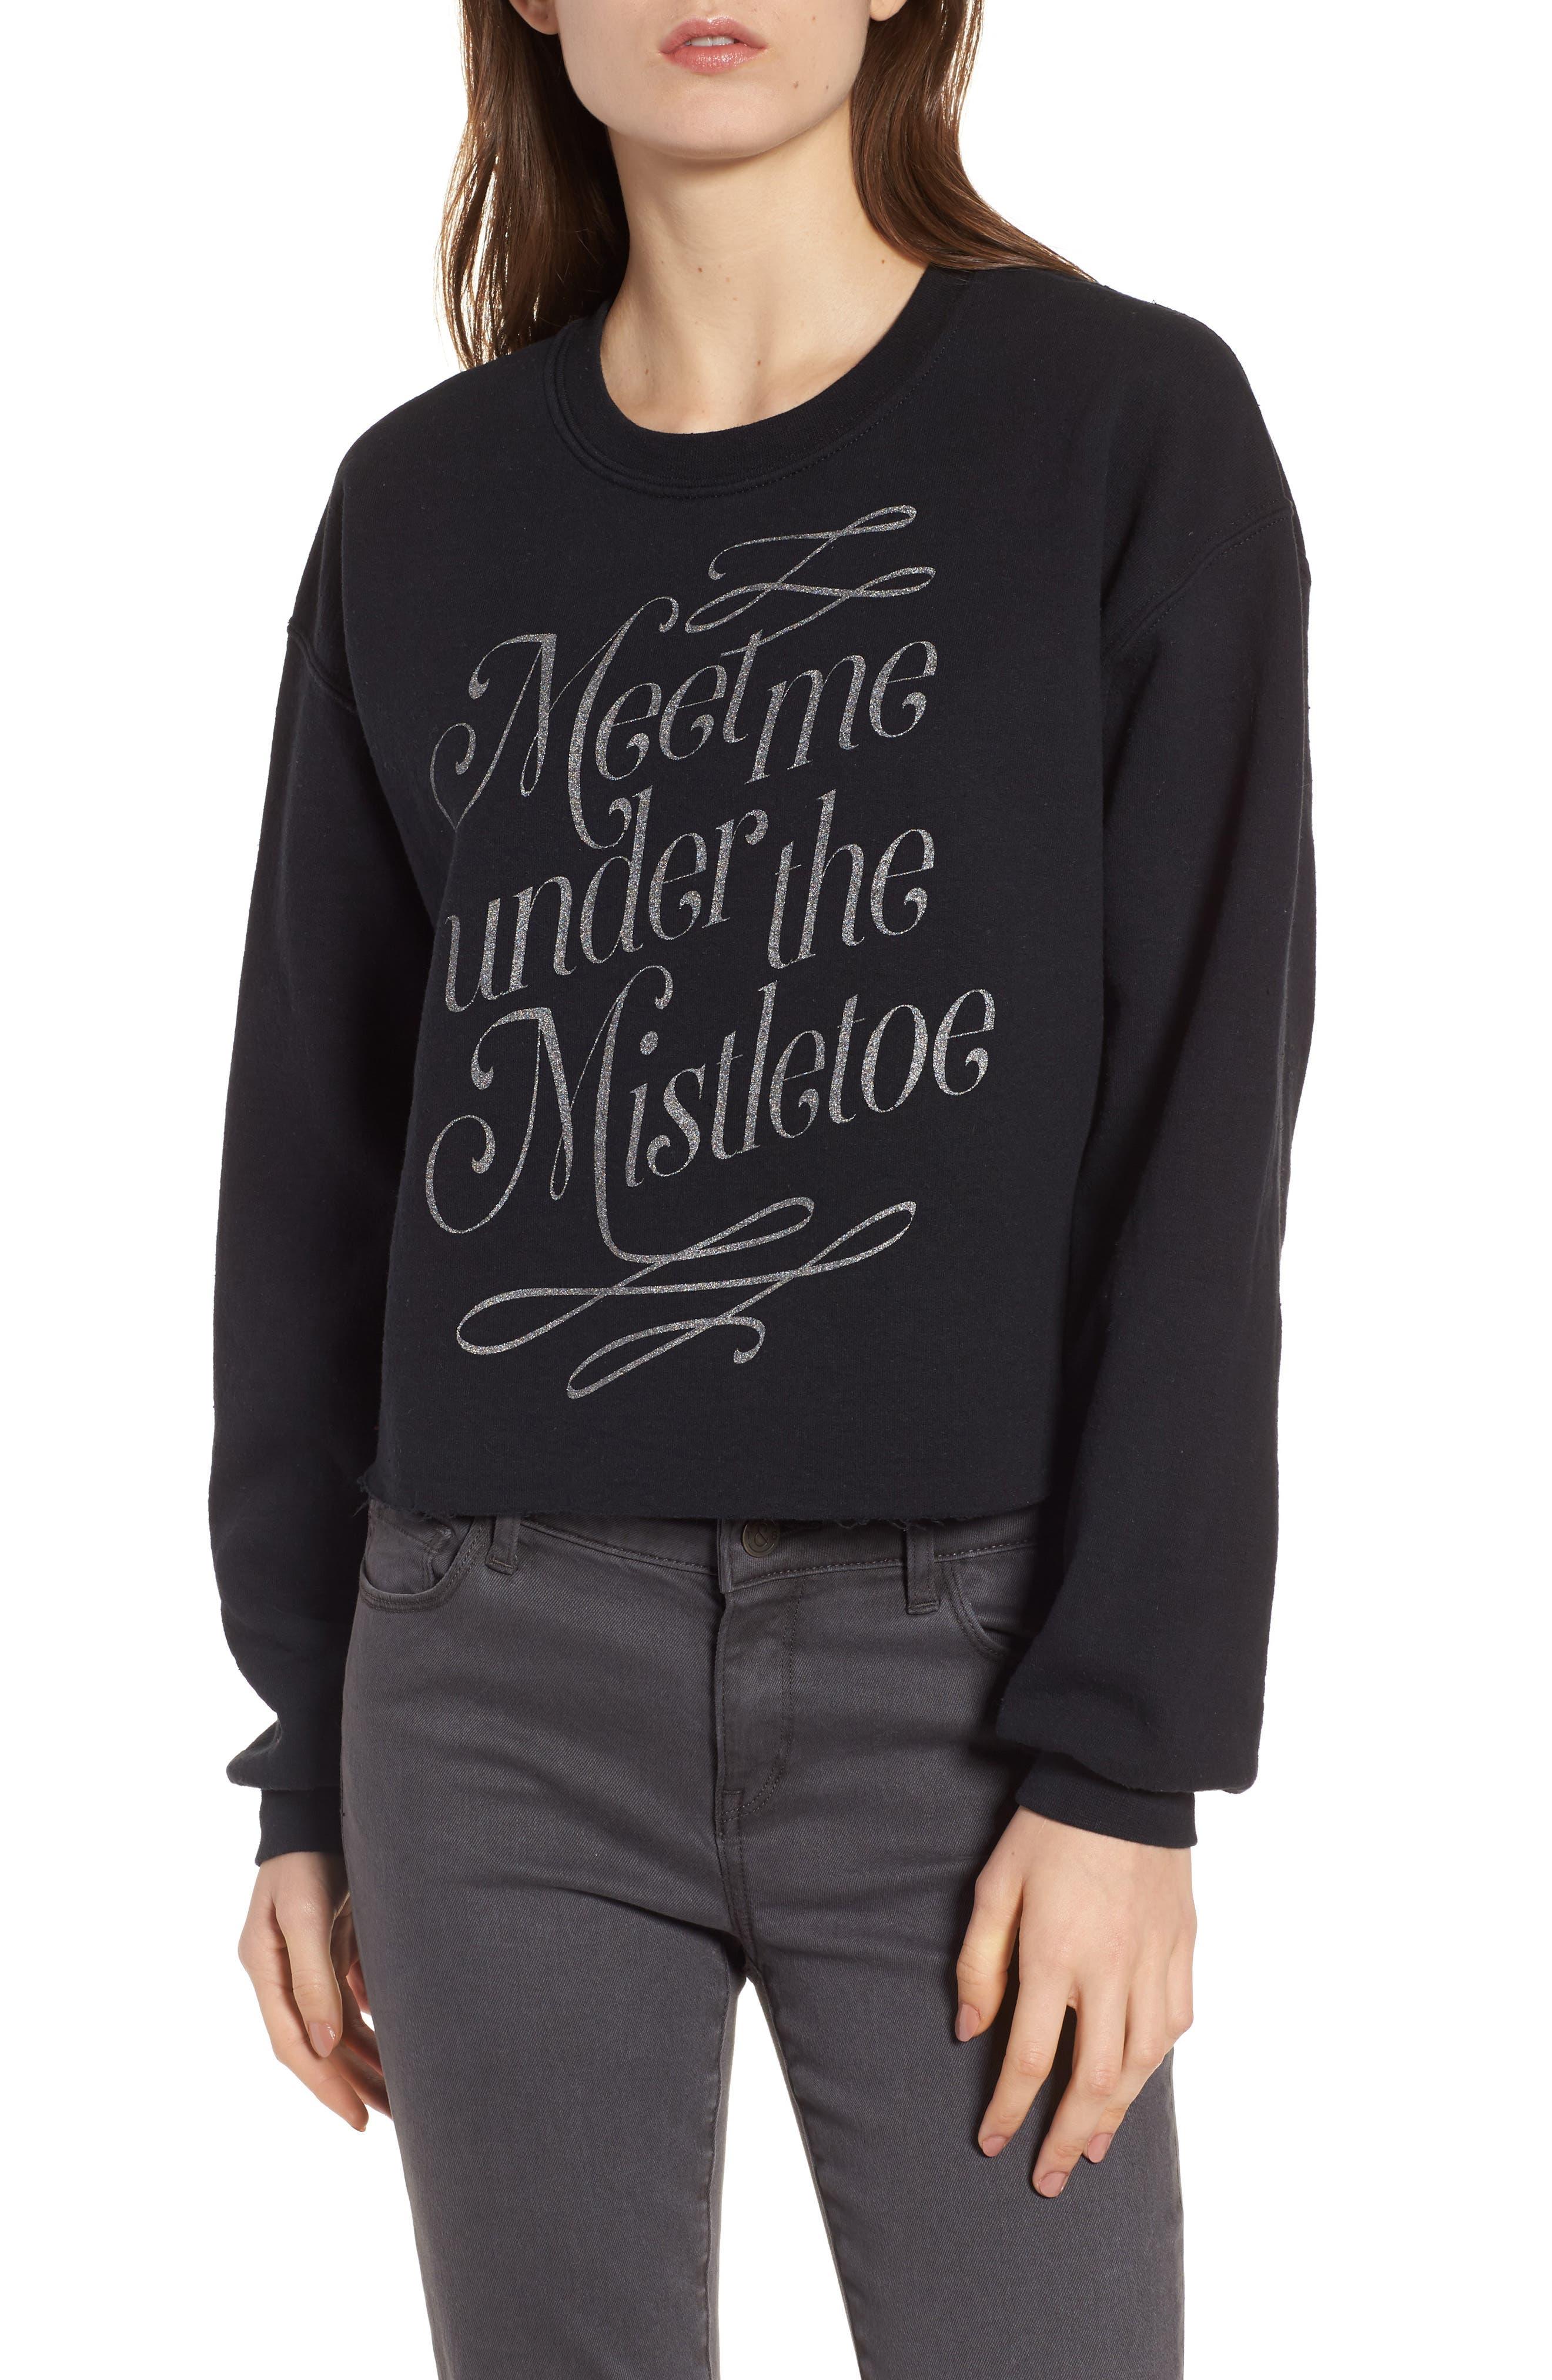 Junk Food Mistletoe Sweatshirt